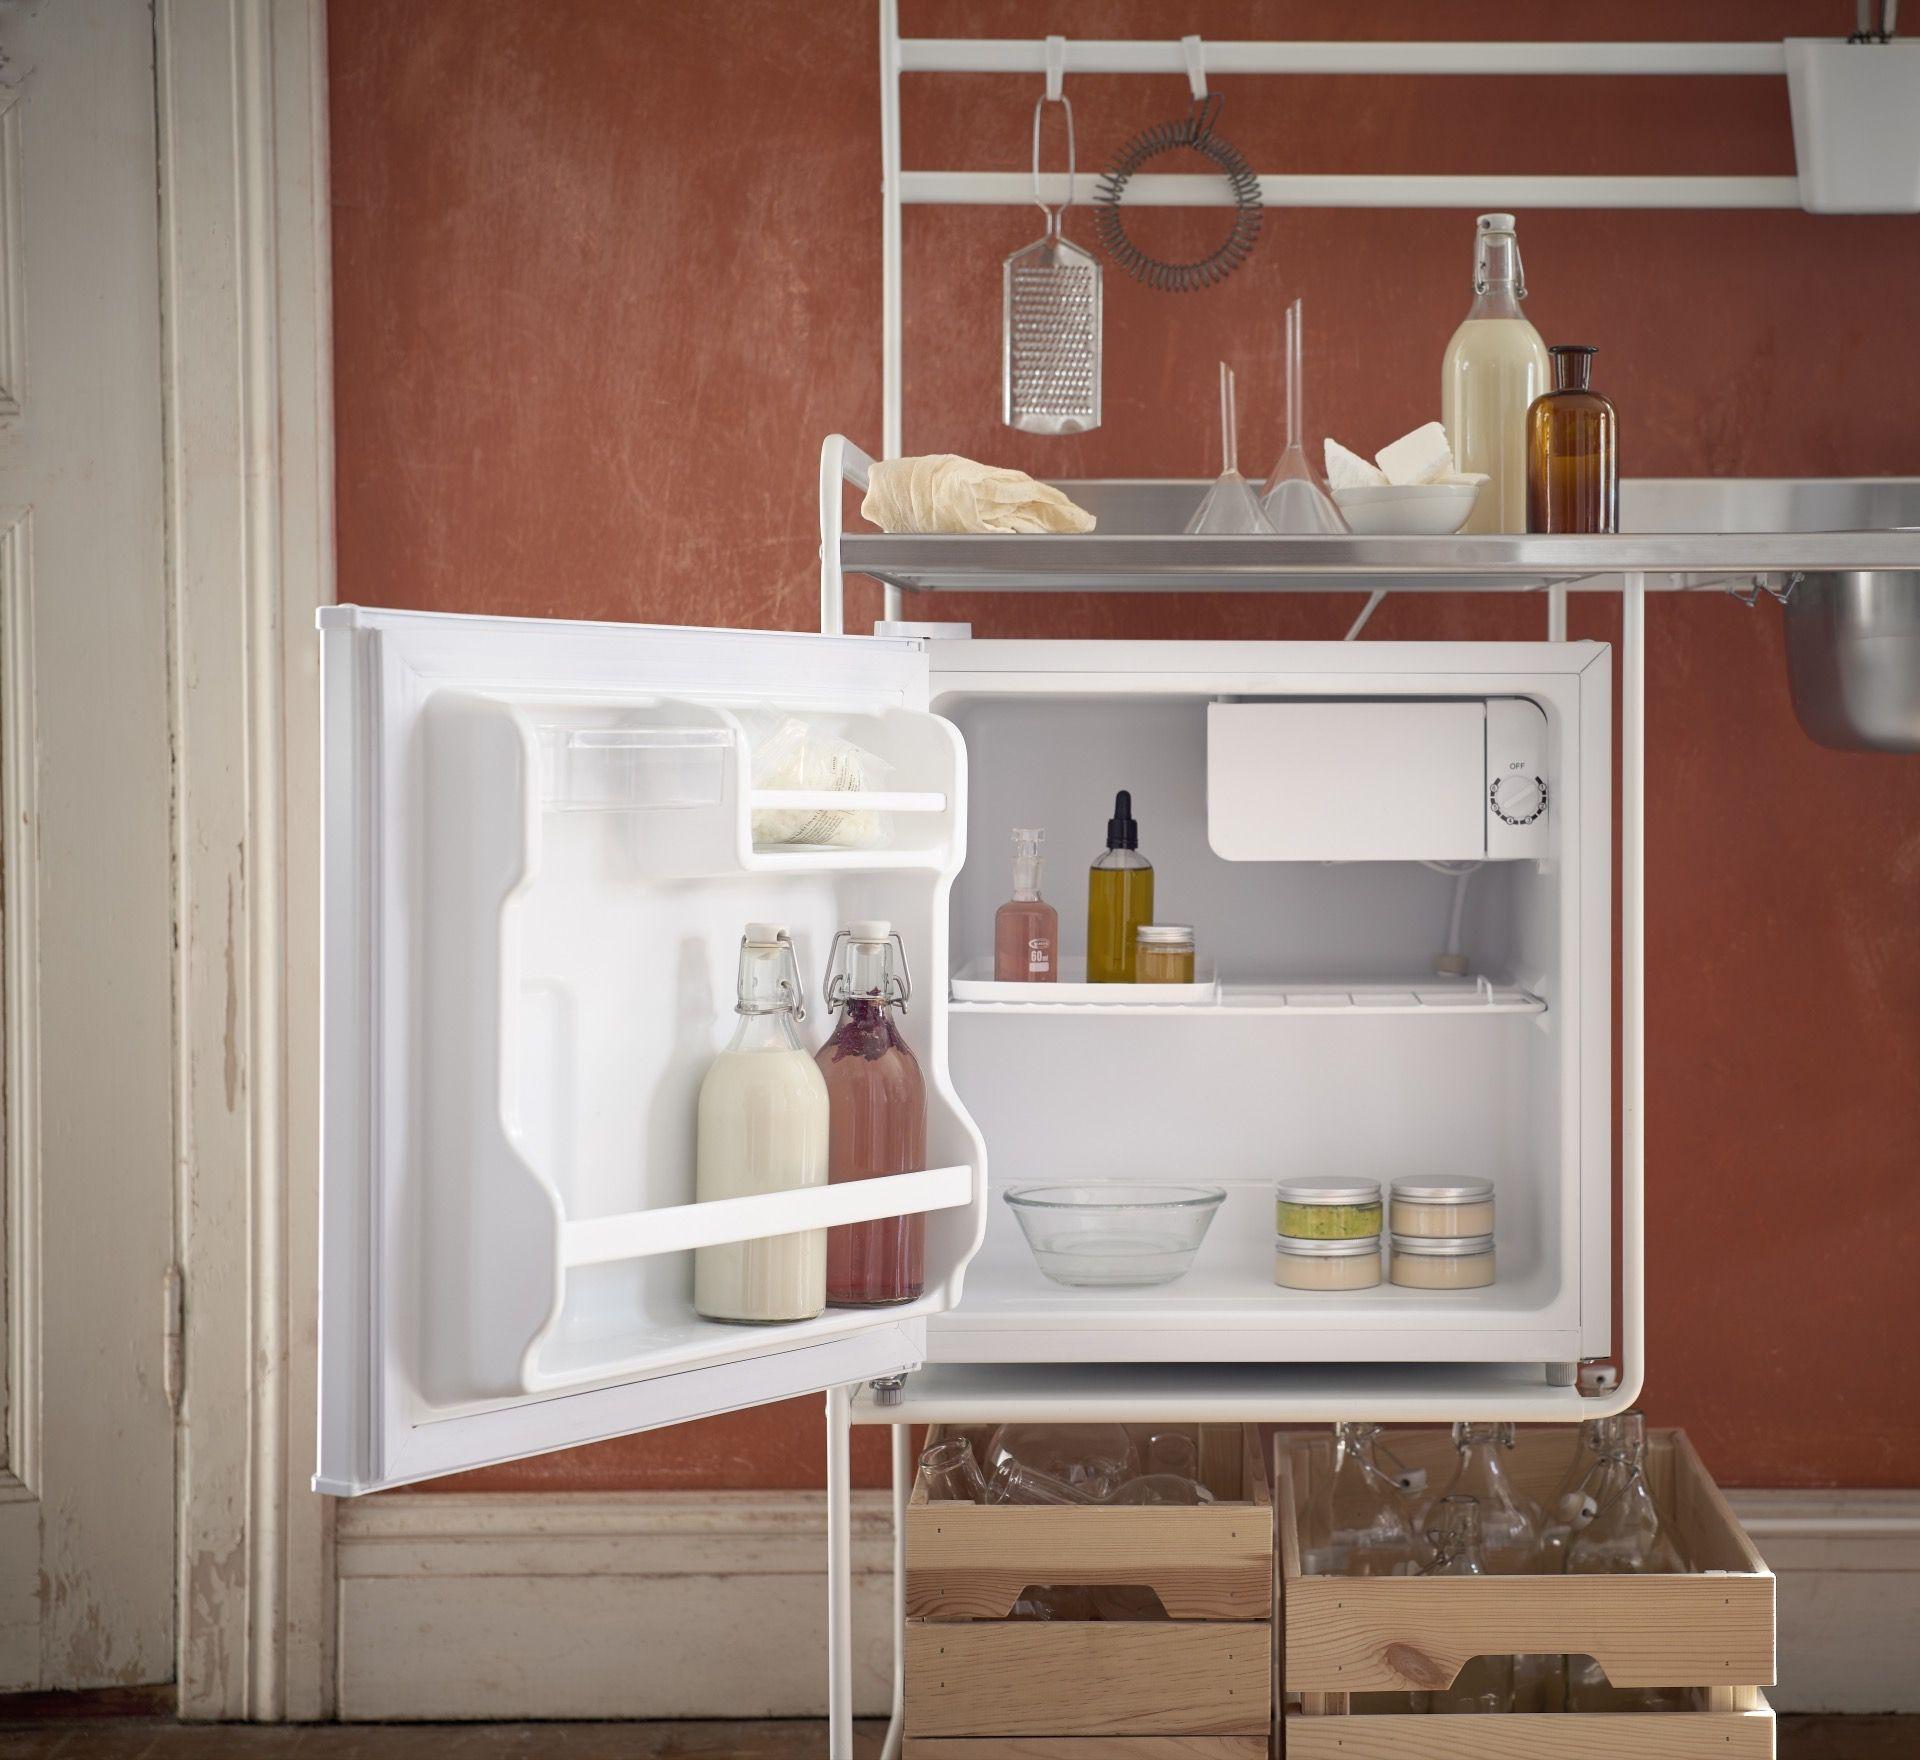 SUNNERSTA Cocina mini IKEA | Ikea, Mini cocina, Cocina ikea